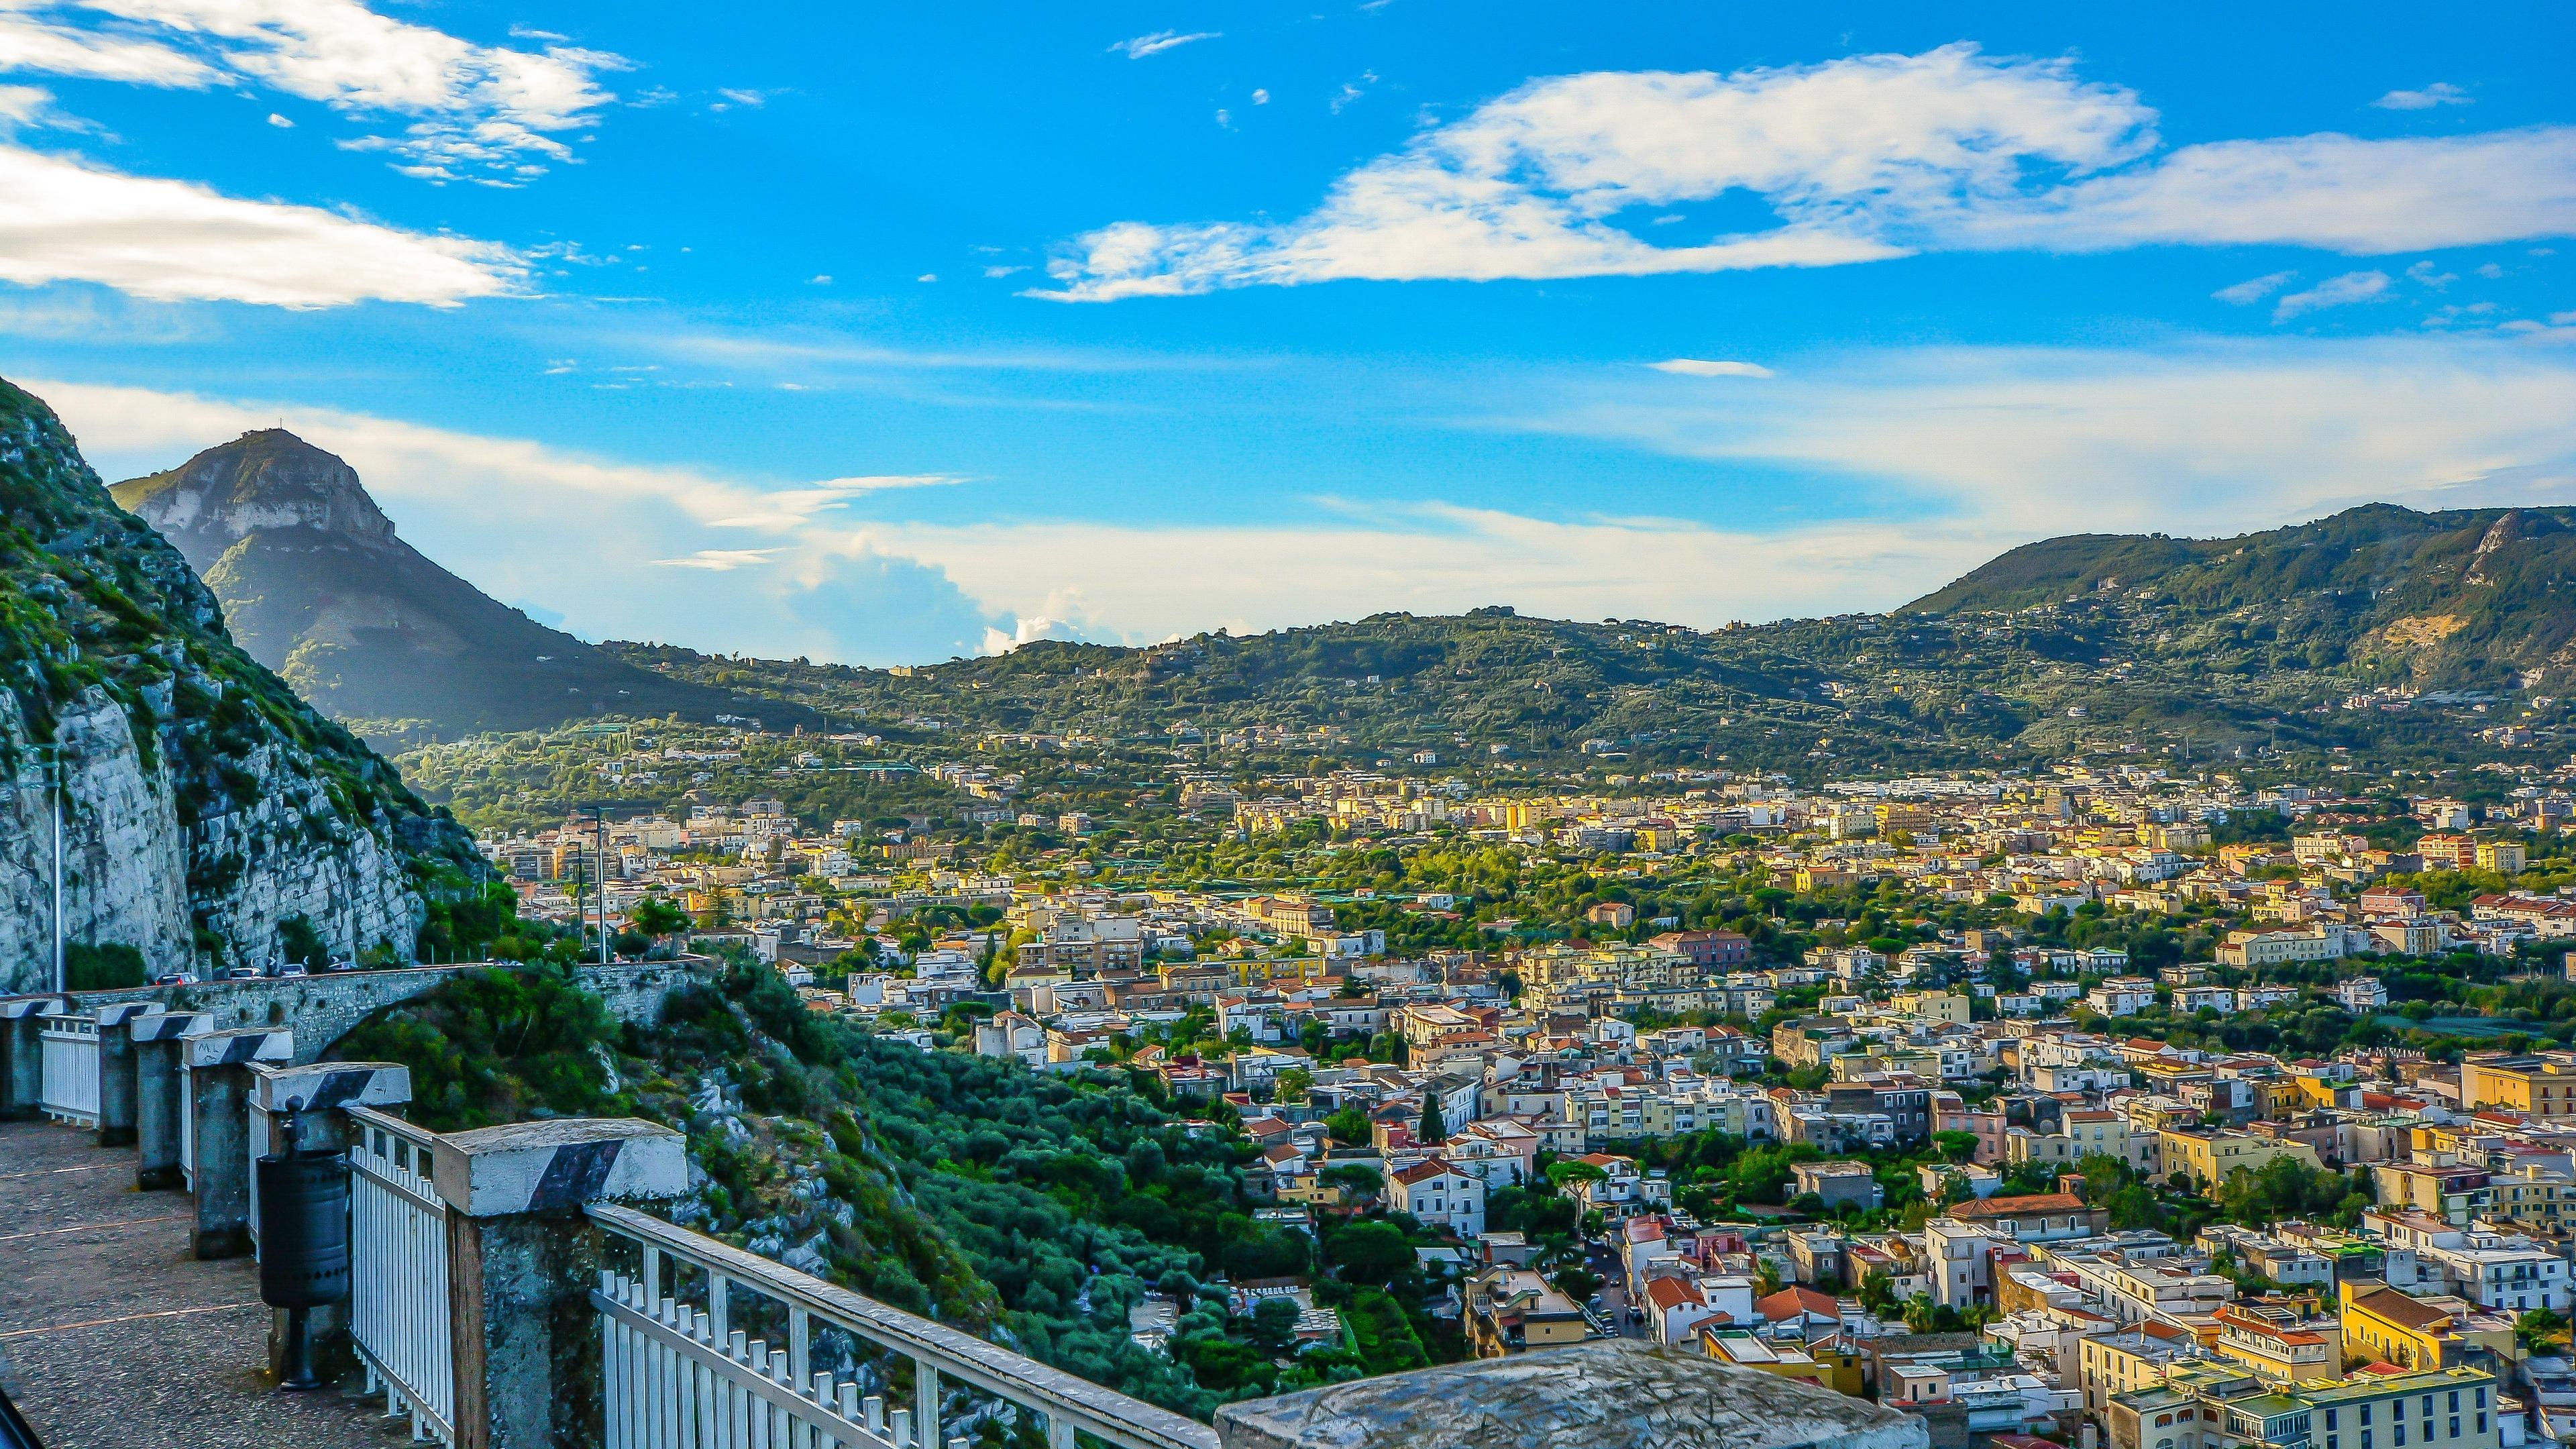 amalfi italy mountains architecture 4k 1538064951 - amalfi, italy, mountains, architecture 4k - Mountains, Italy, amalfi